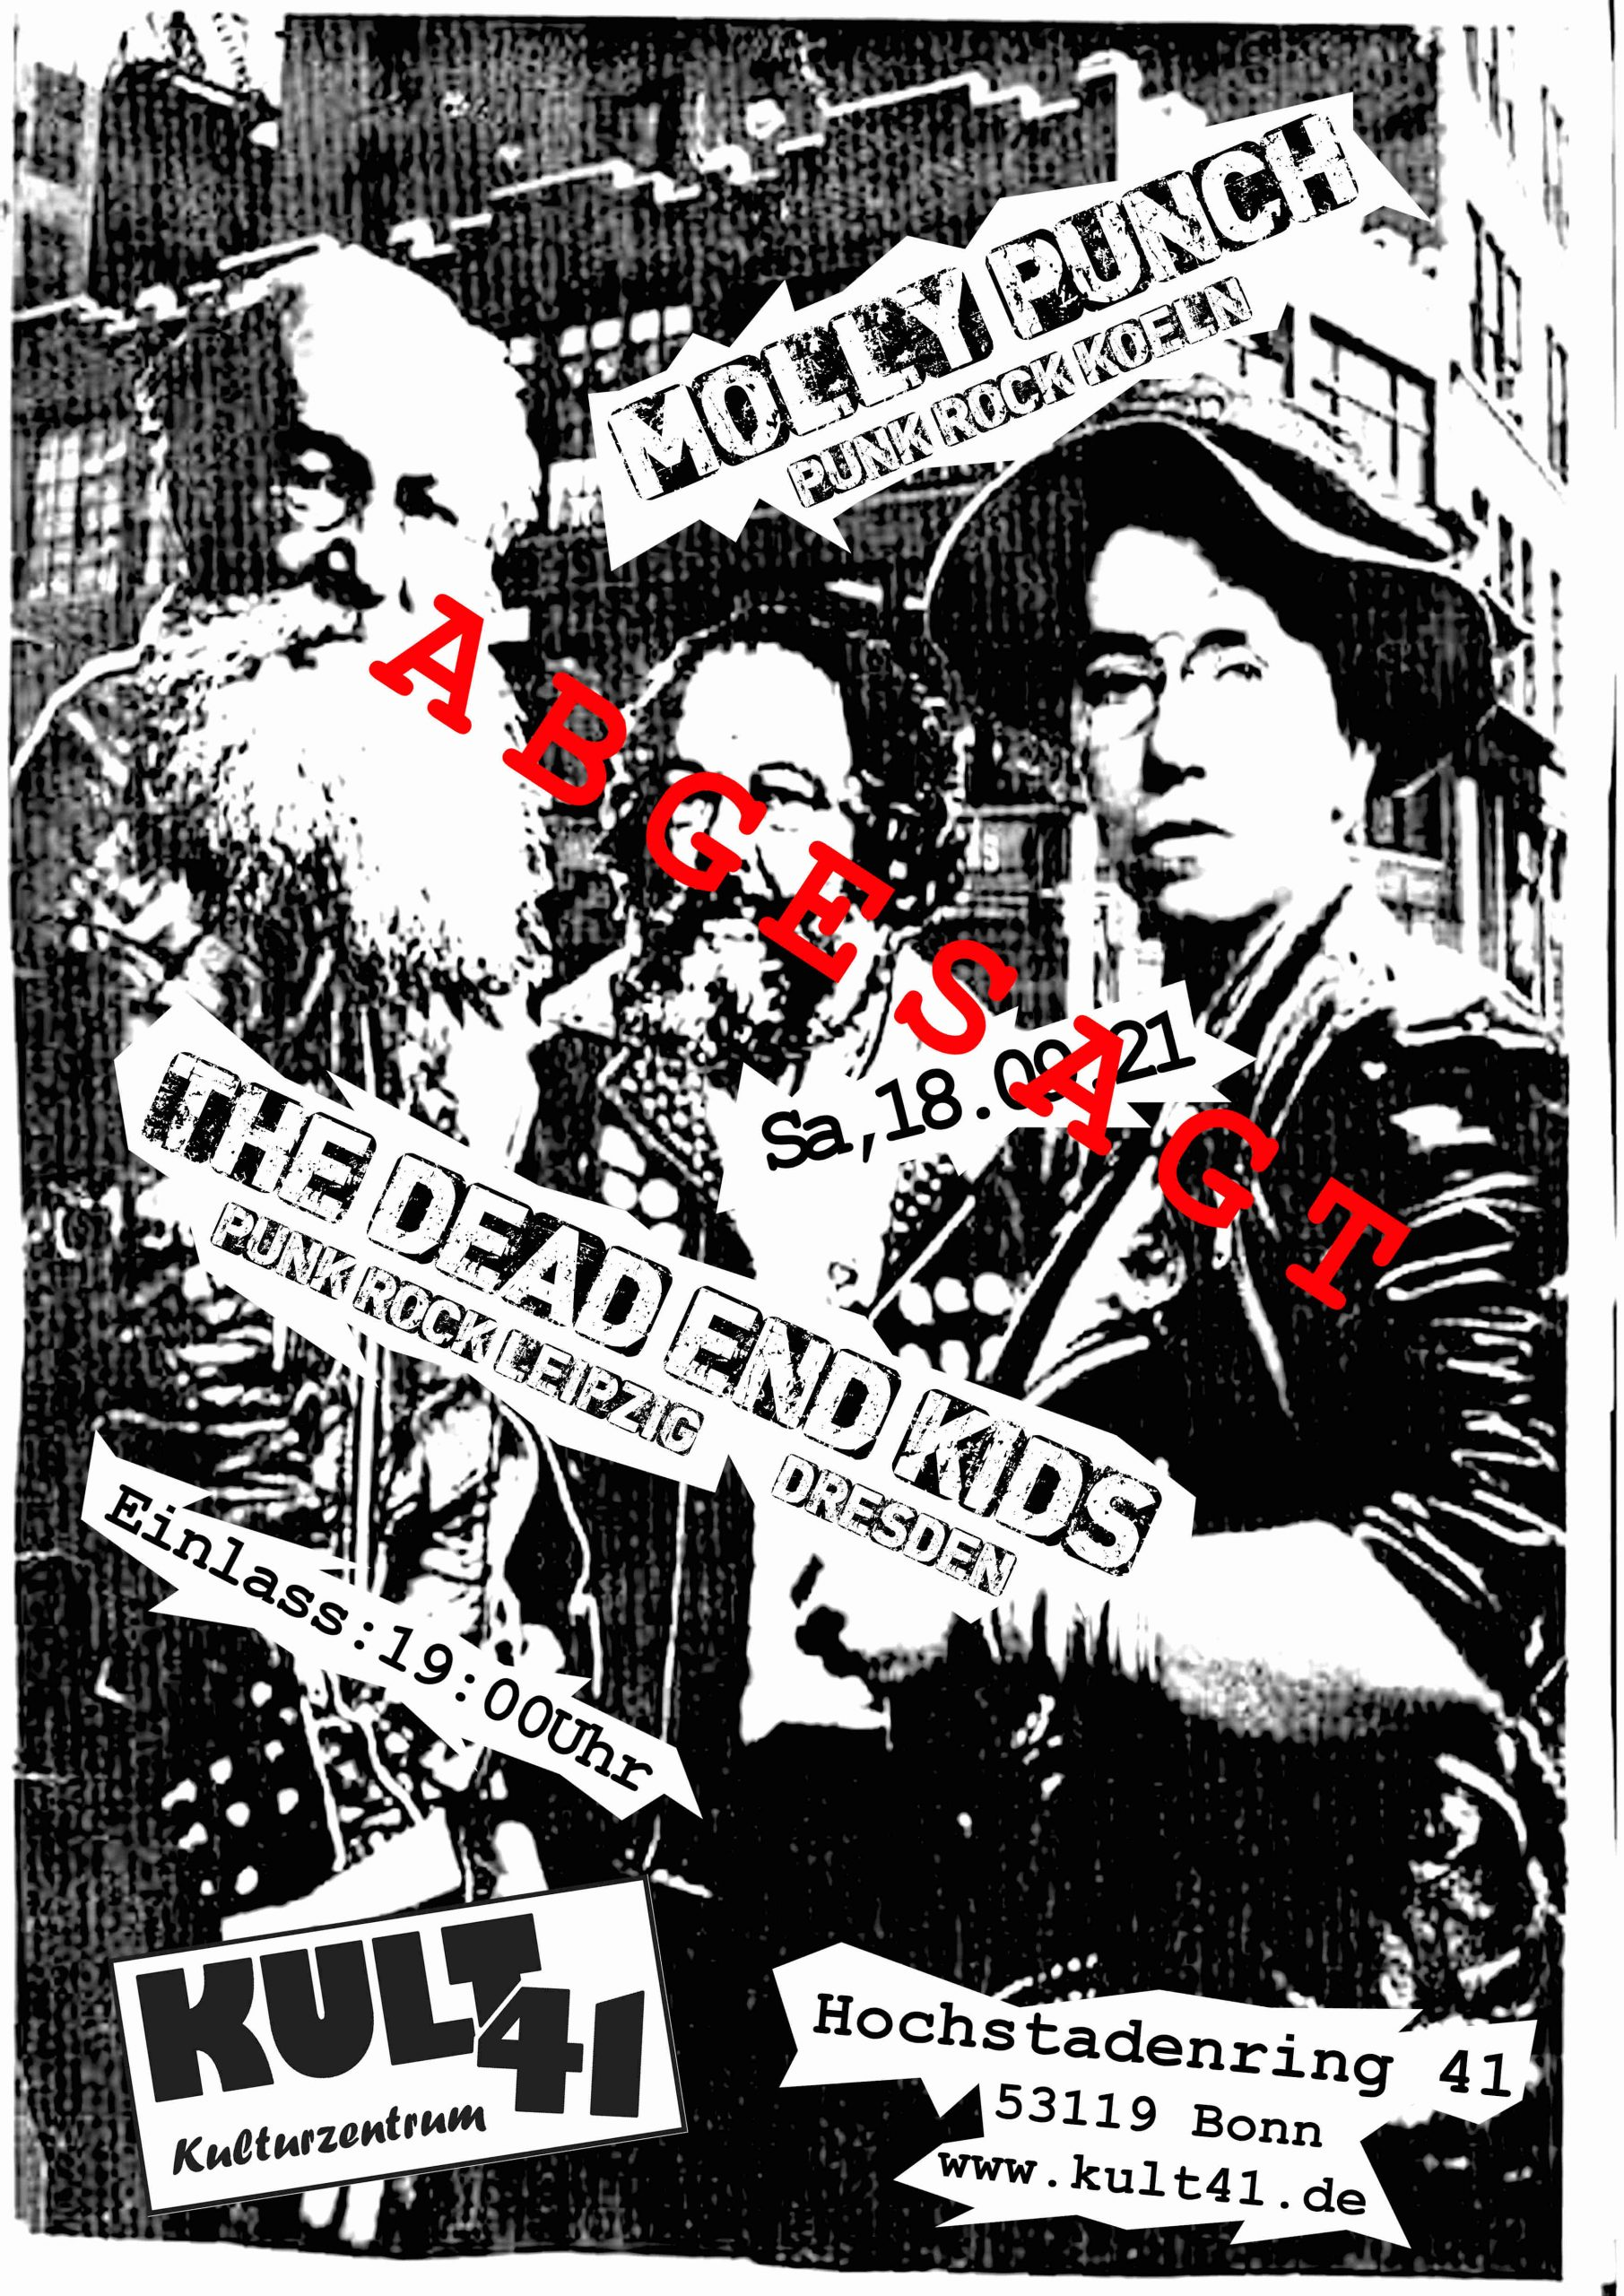 --- ABGESAGT --- The Dead End Kids + Molly Punch --- ABGESAGT ---